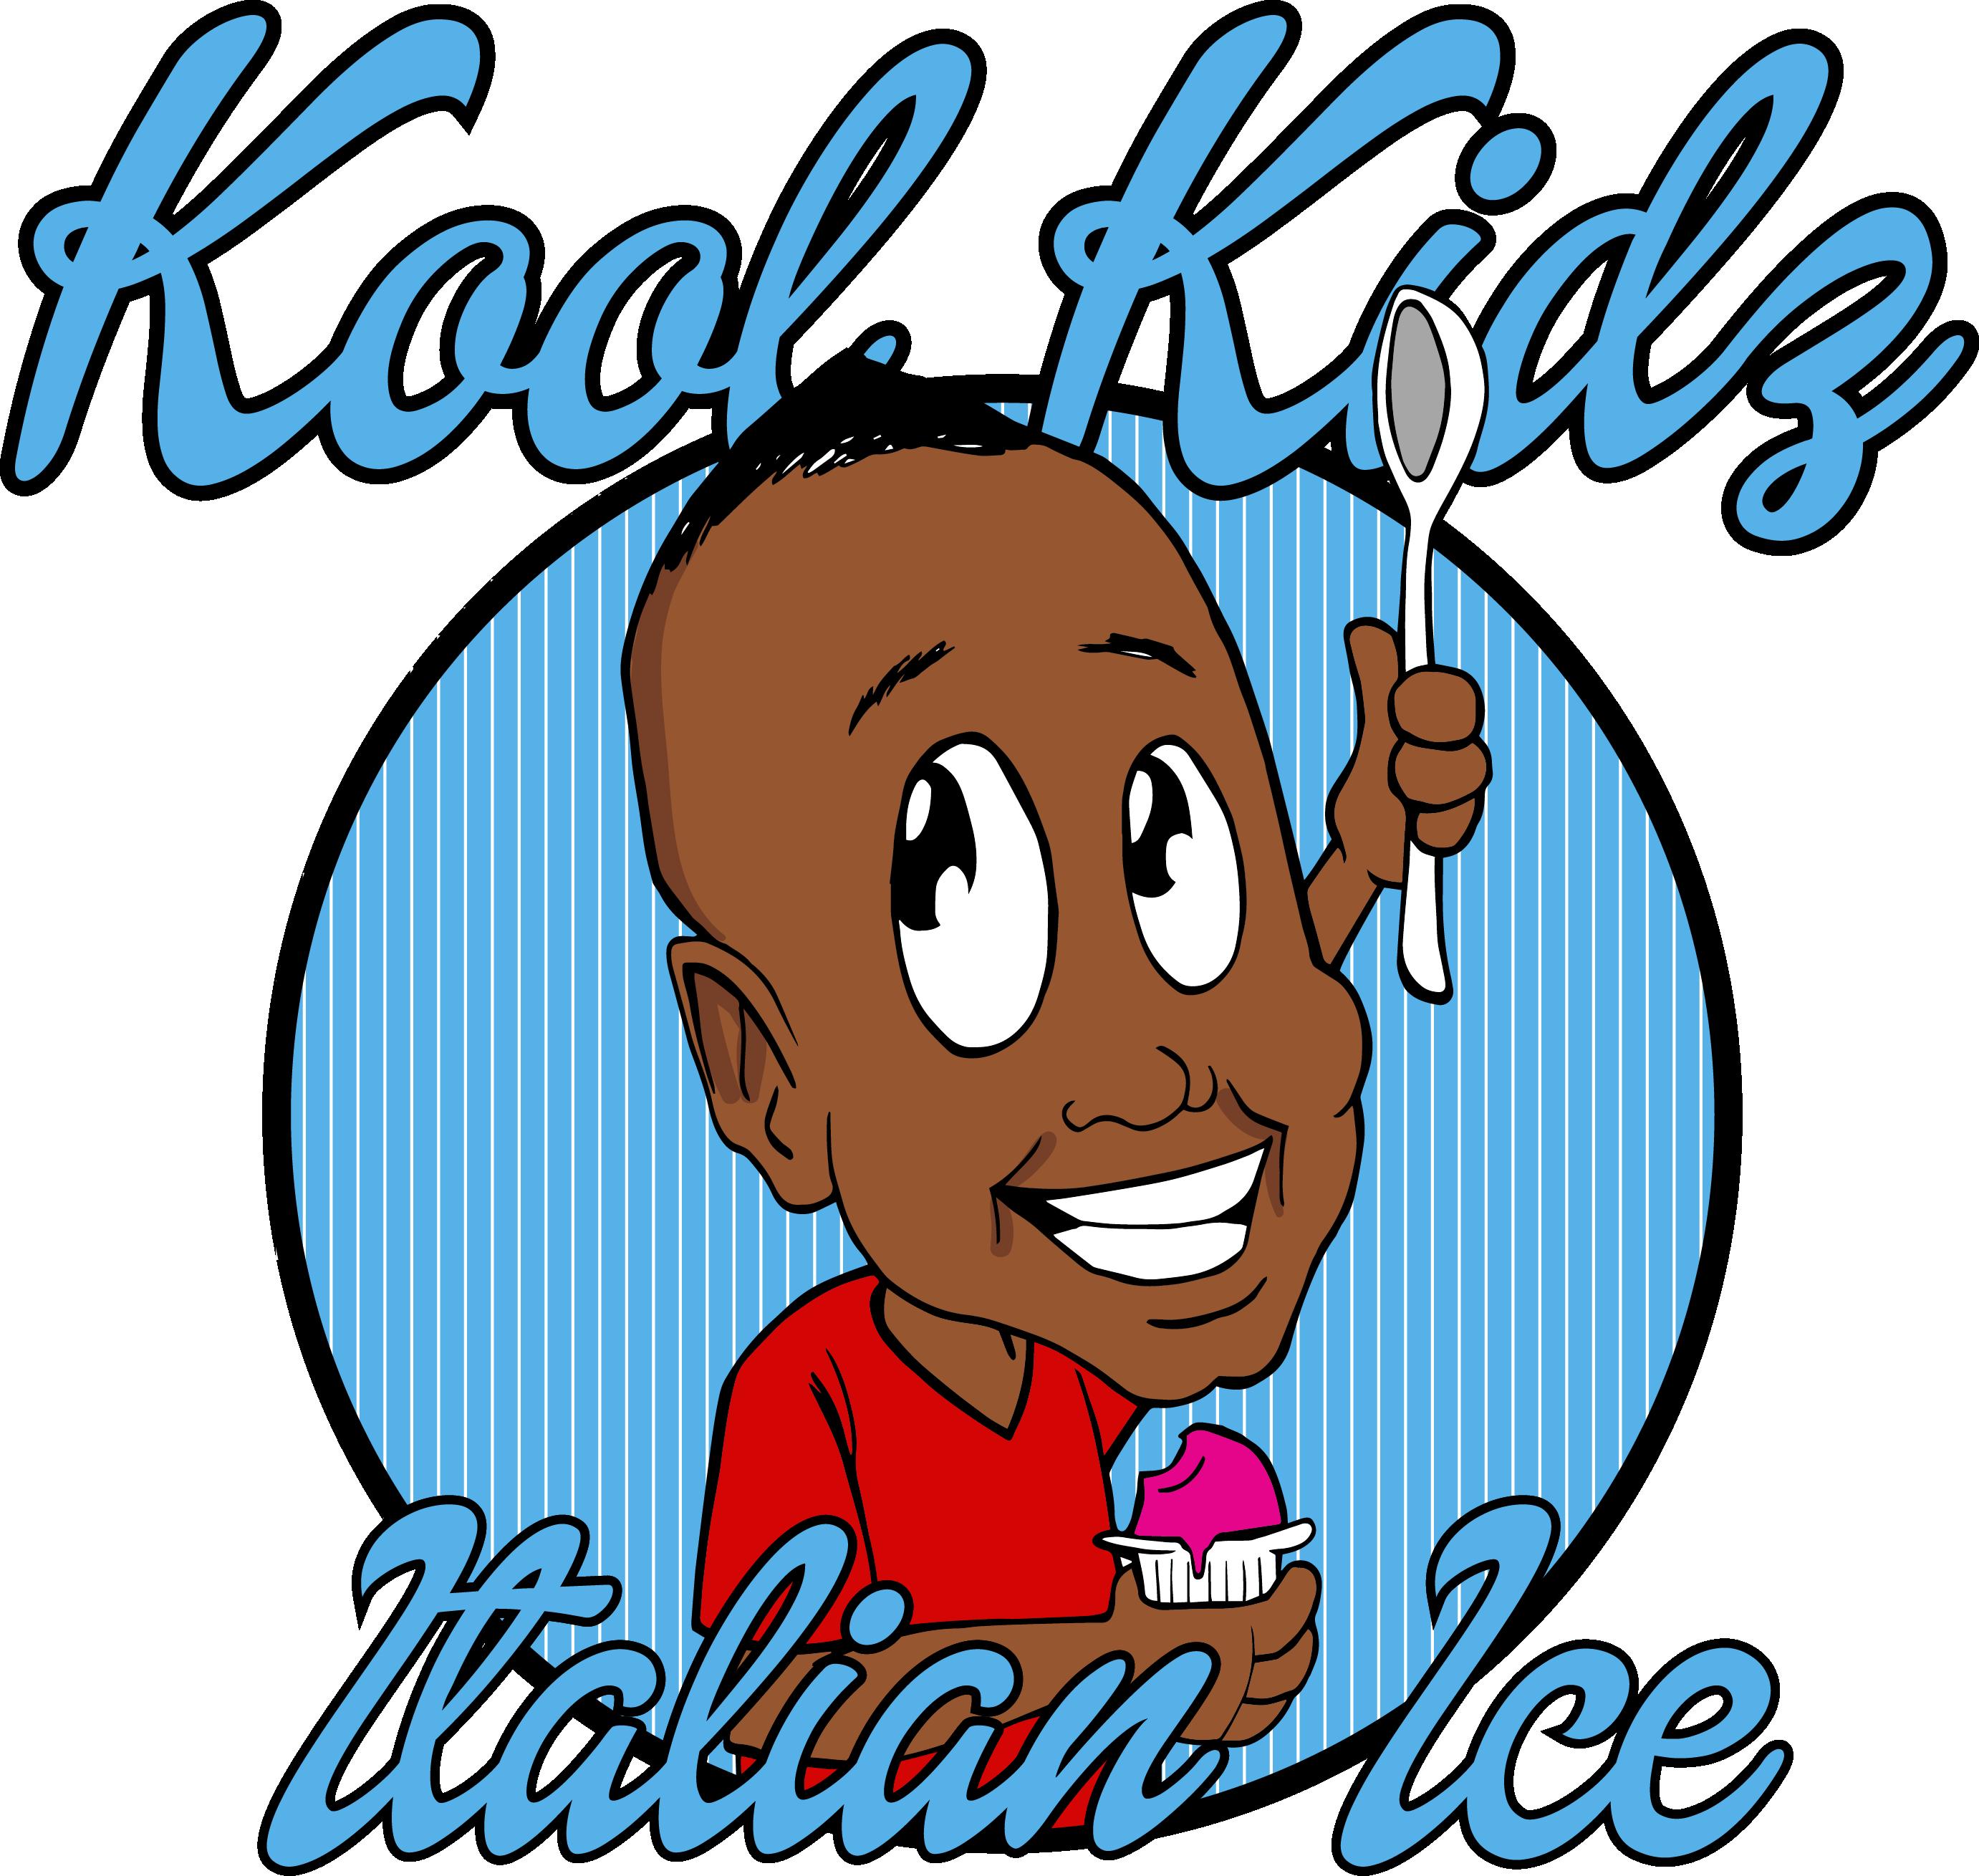 Ice clipart italian ice, Ice italian ice Transparent FREE.